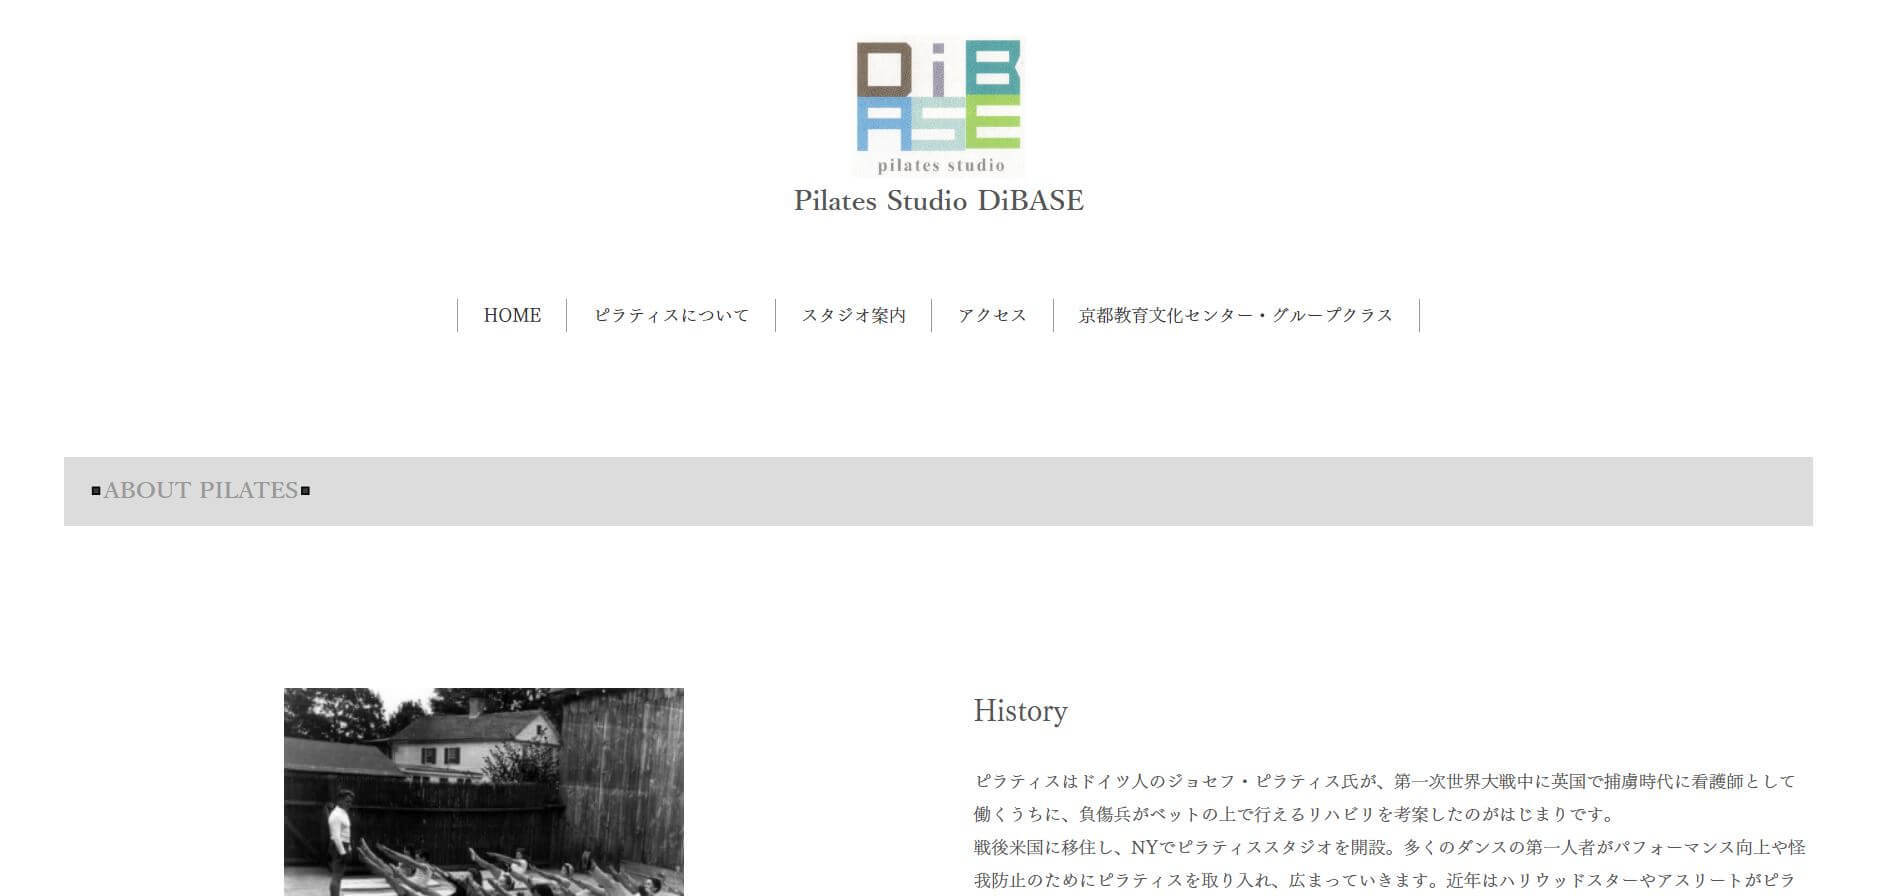 Pilates Studio DiBASE